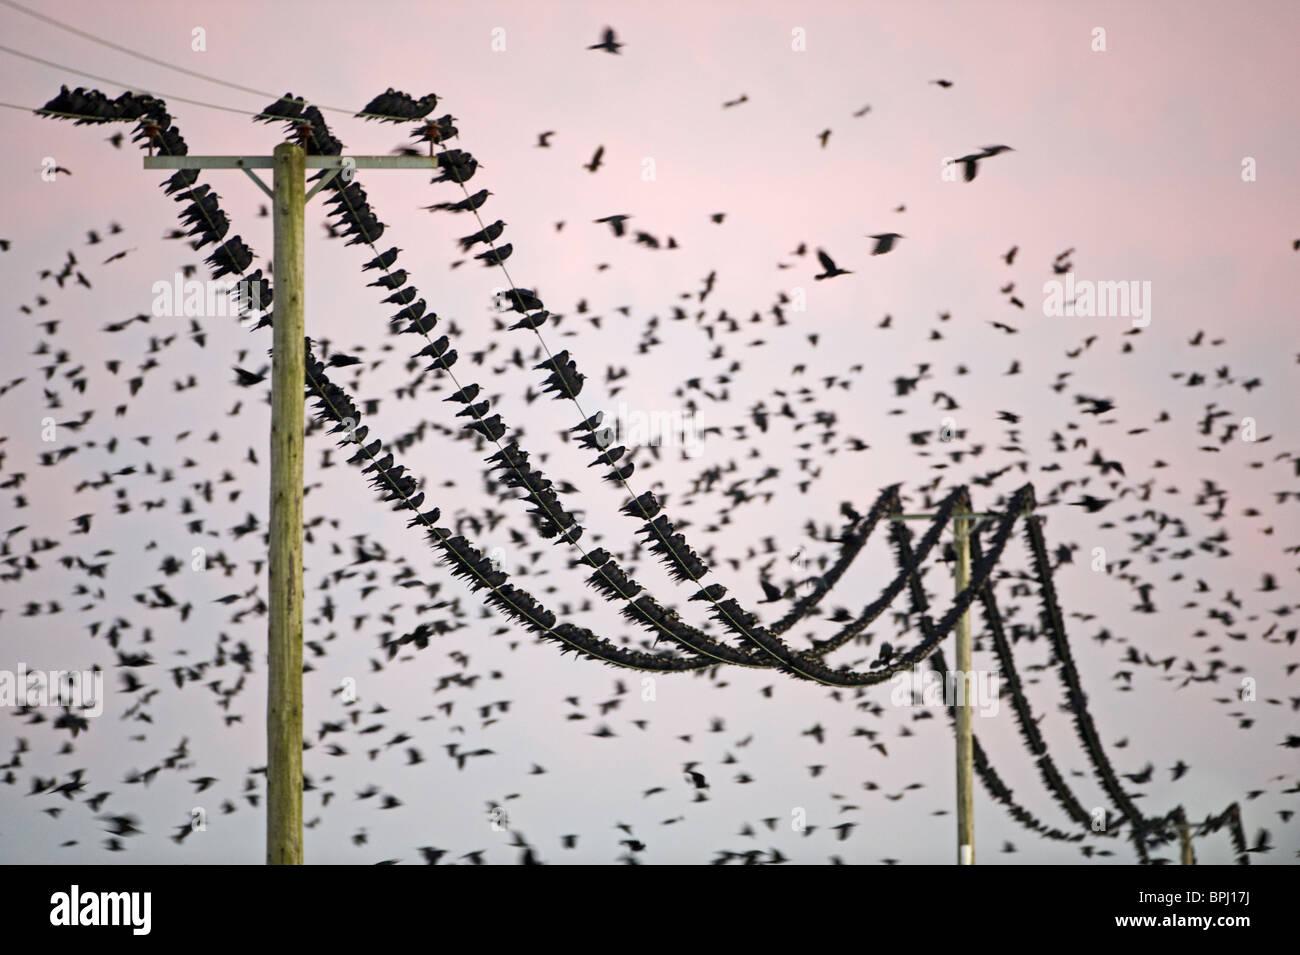 Saatkrähen Corvus Frugilegus in Pre-Schlafplatz sammeln Buckenham Norfolk winter Stockbild